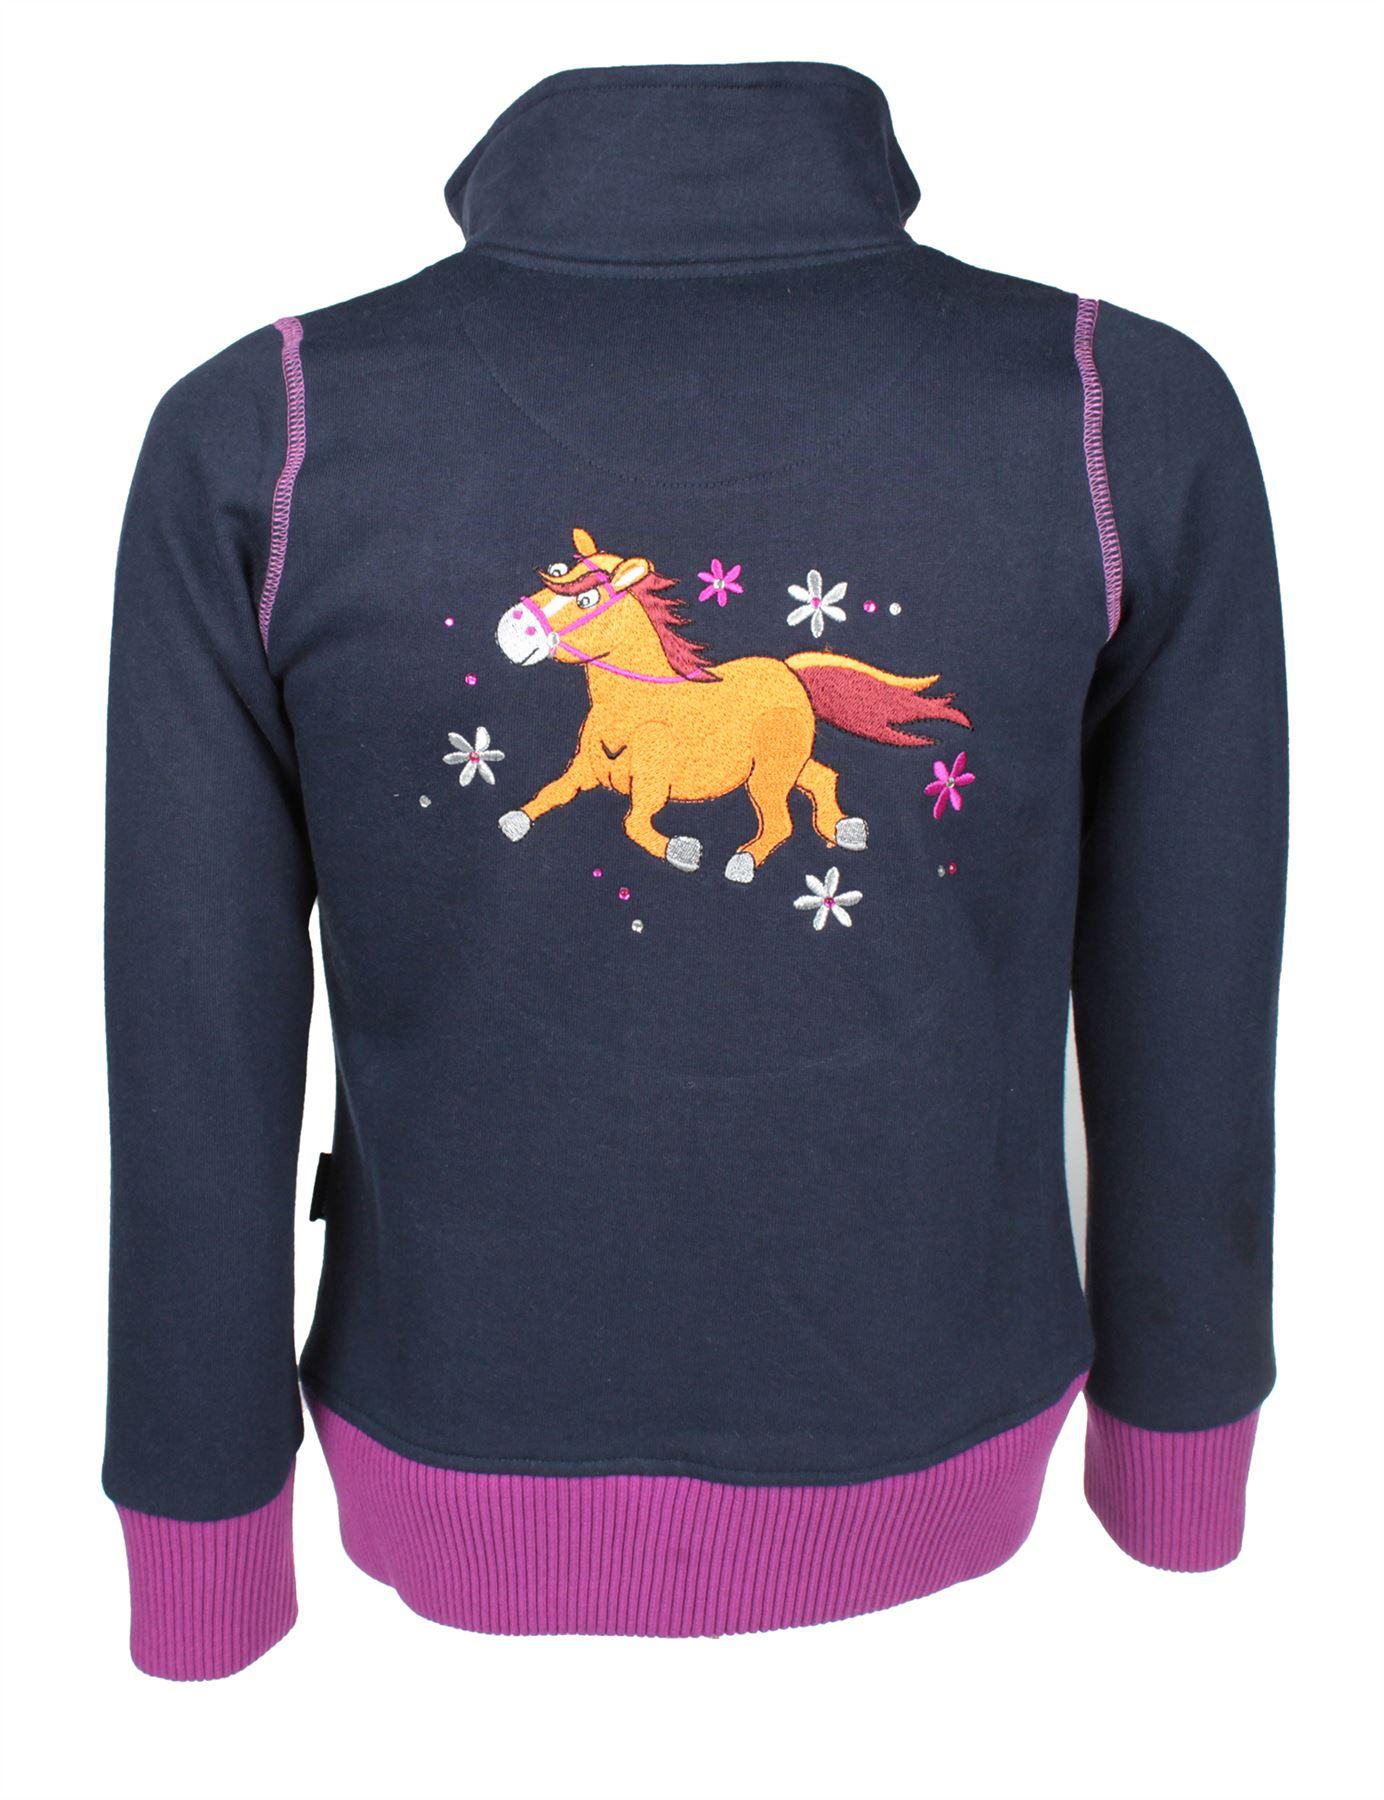 Horka Equestrian Junior Kids Toddlres Cotton Shetty Vests